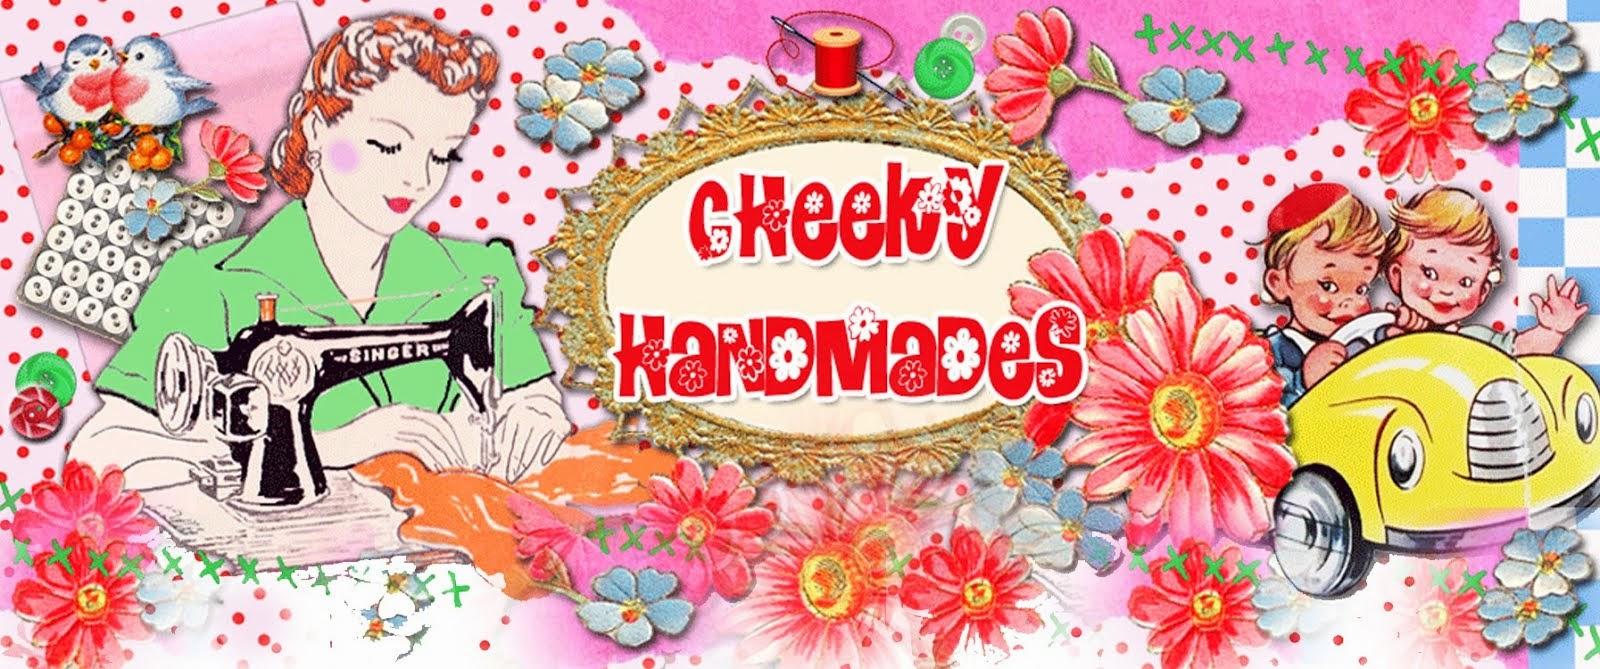 cheekyhandmades